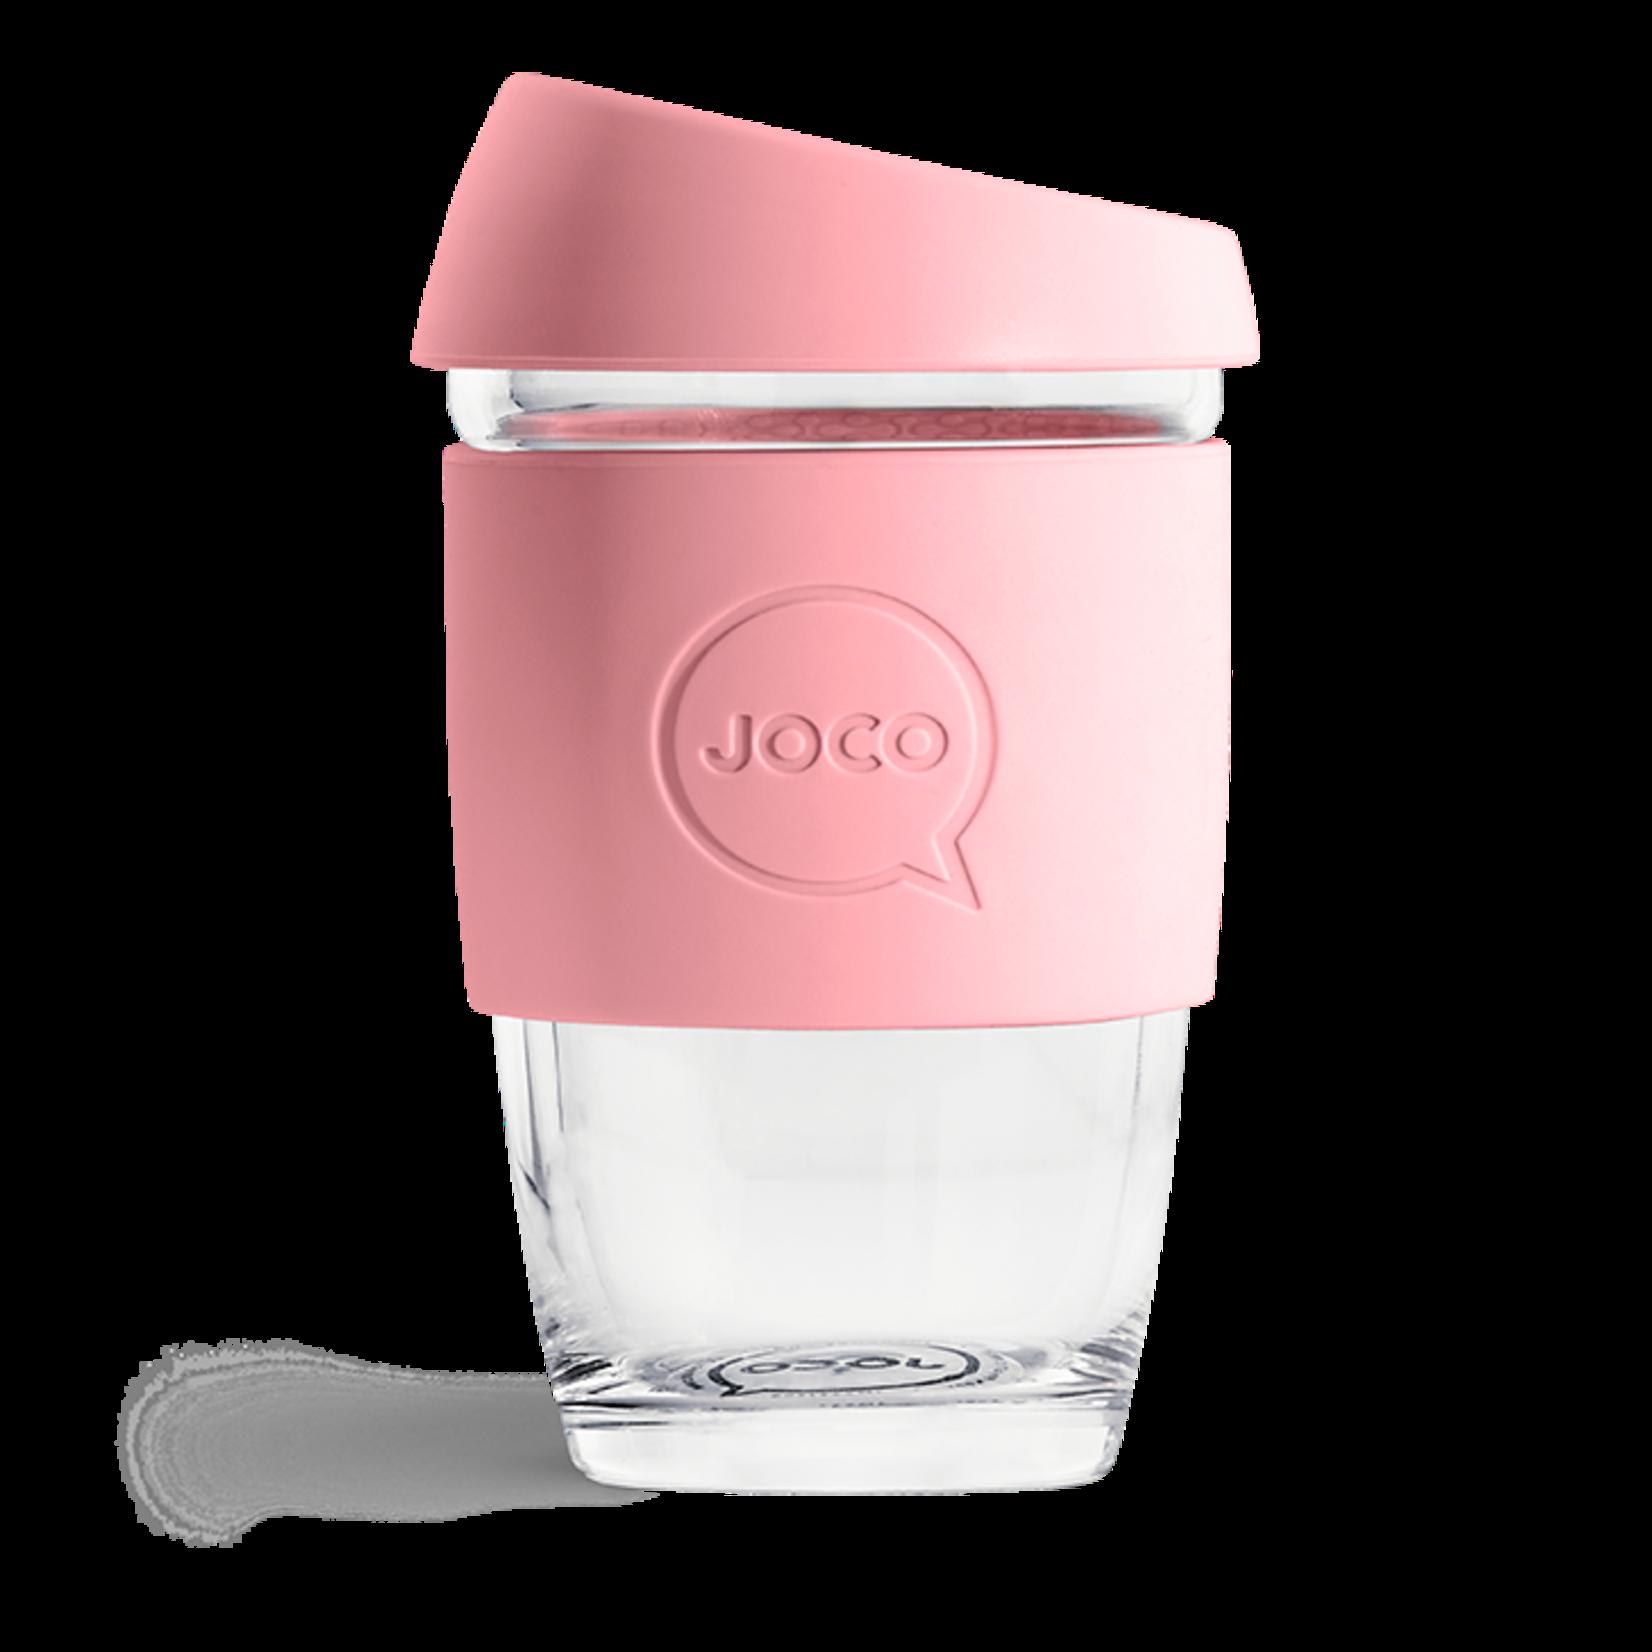 Joco Reusable Glass Cup Strawberry 6oz